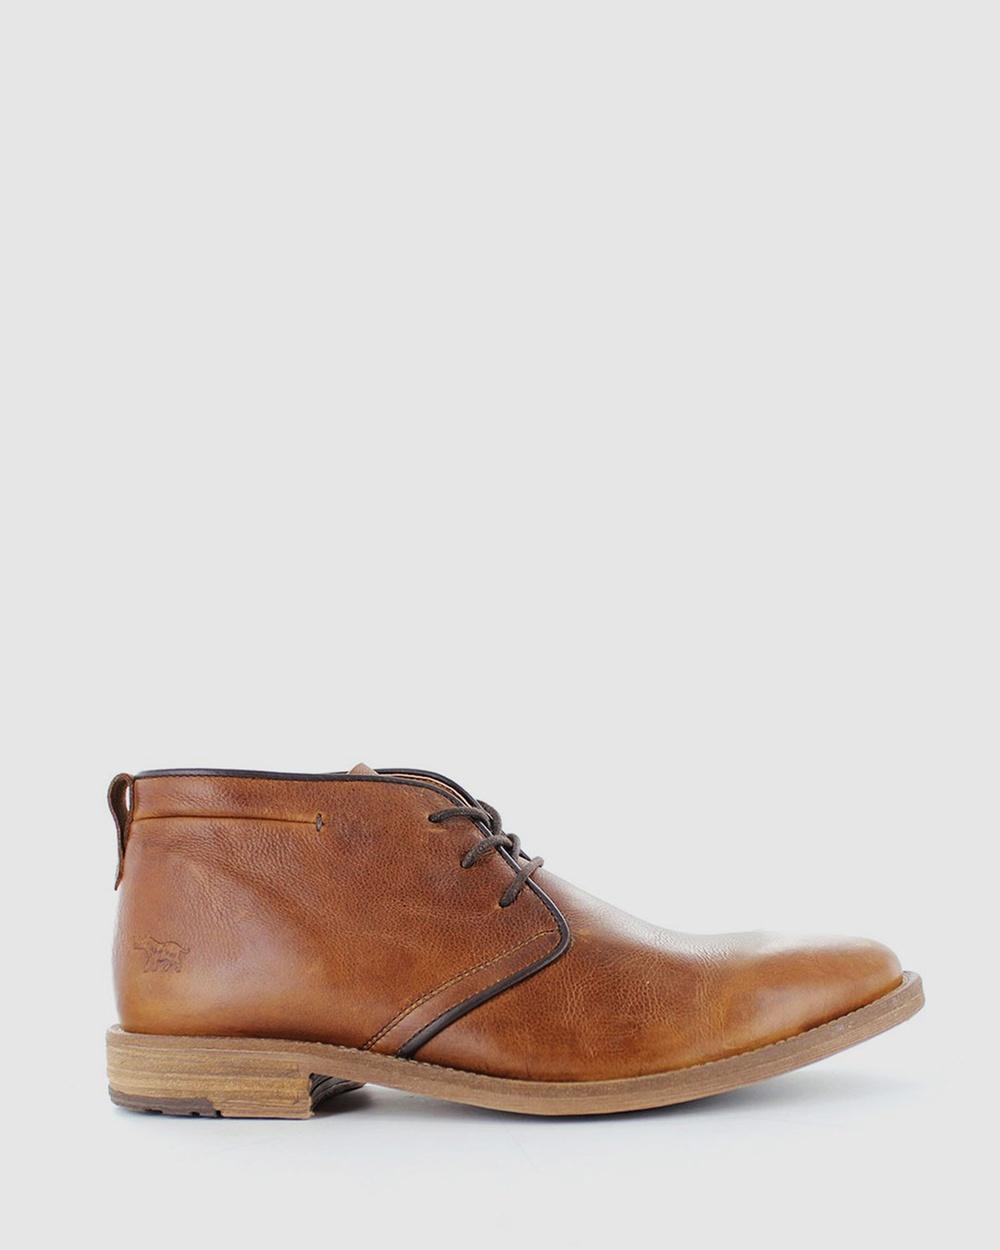 Wild Rhino Utah Boots Casual Shoes Brown